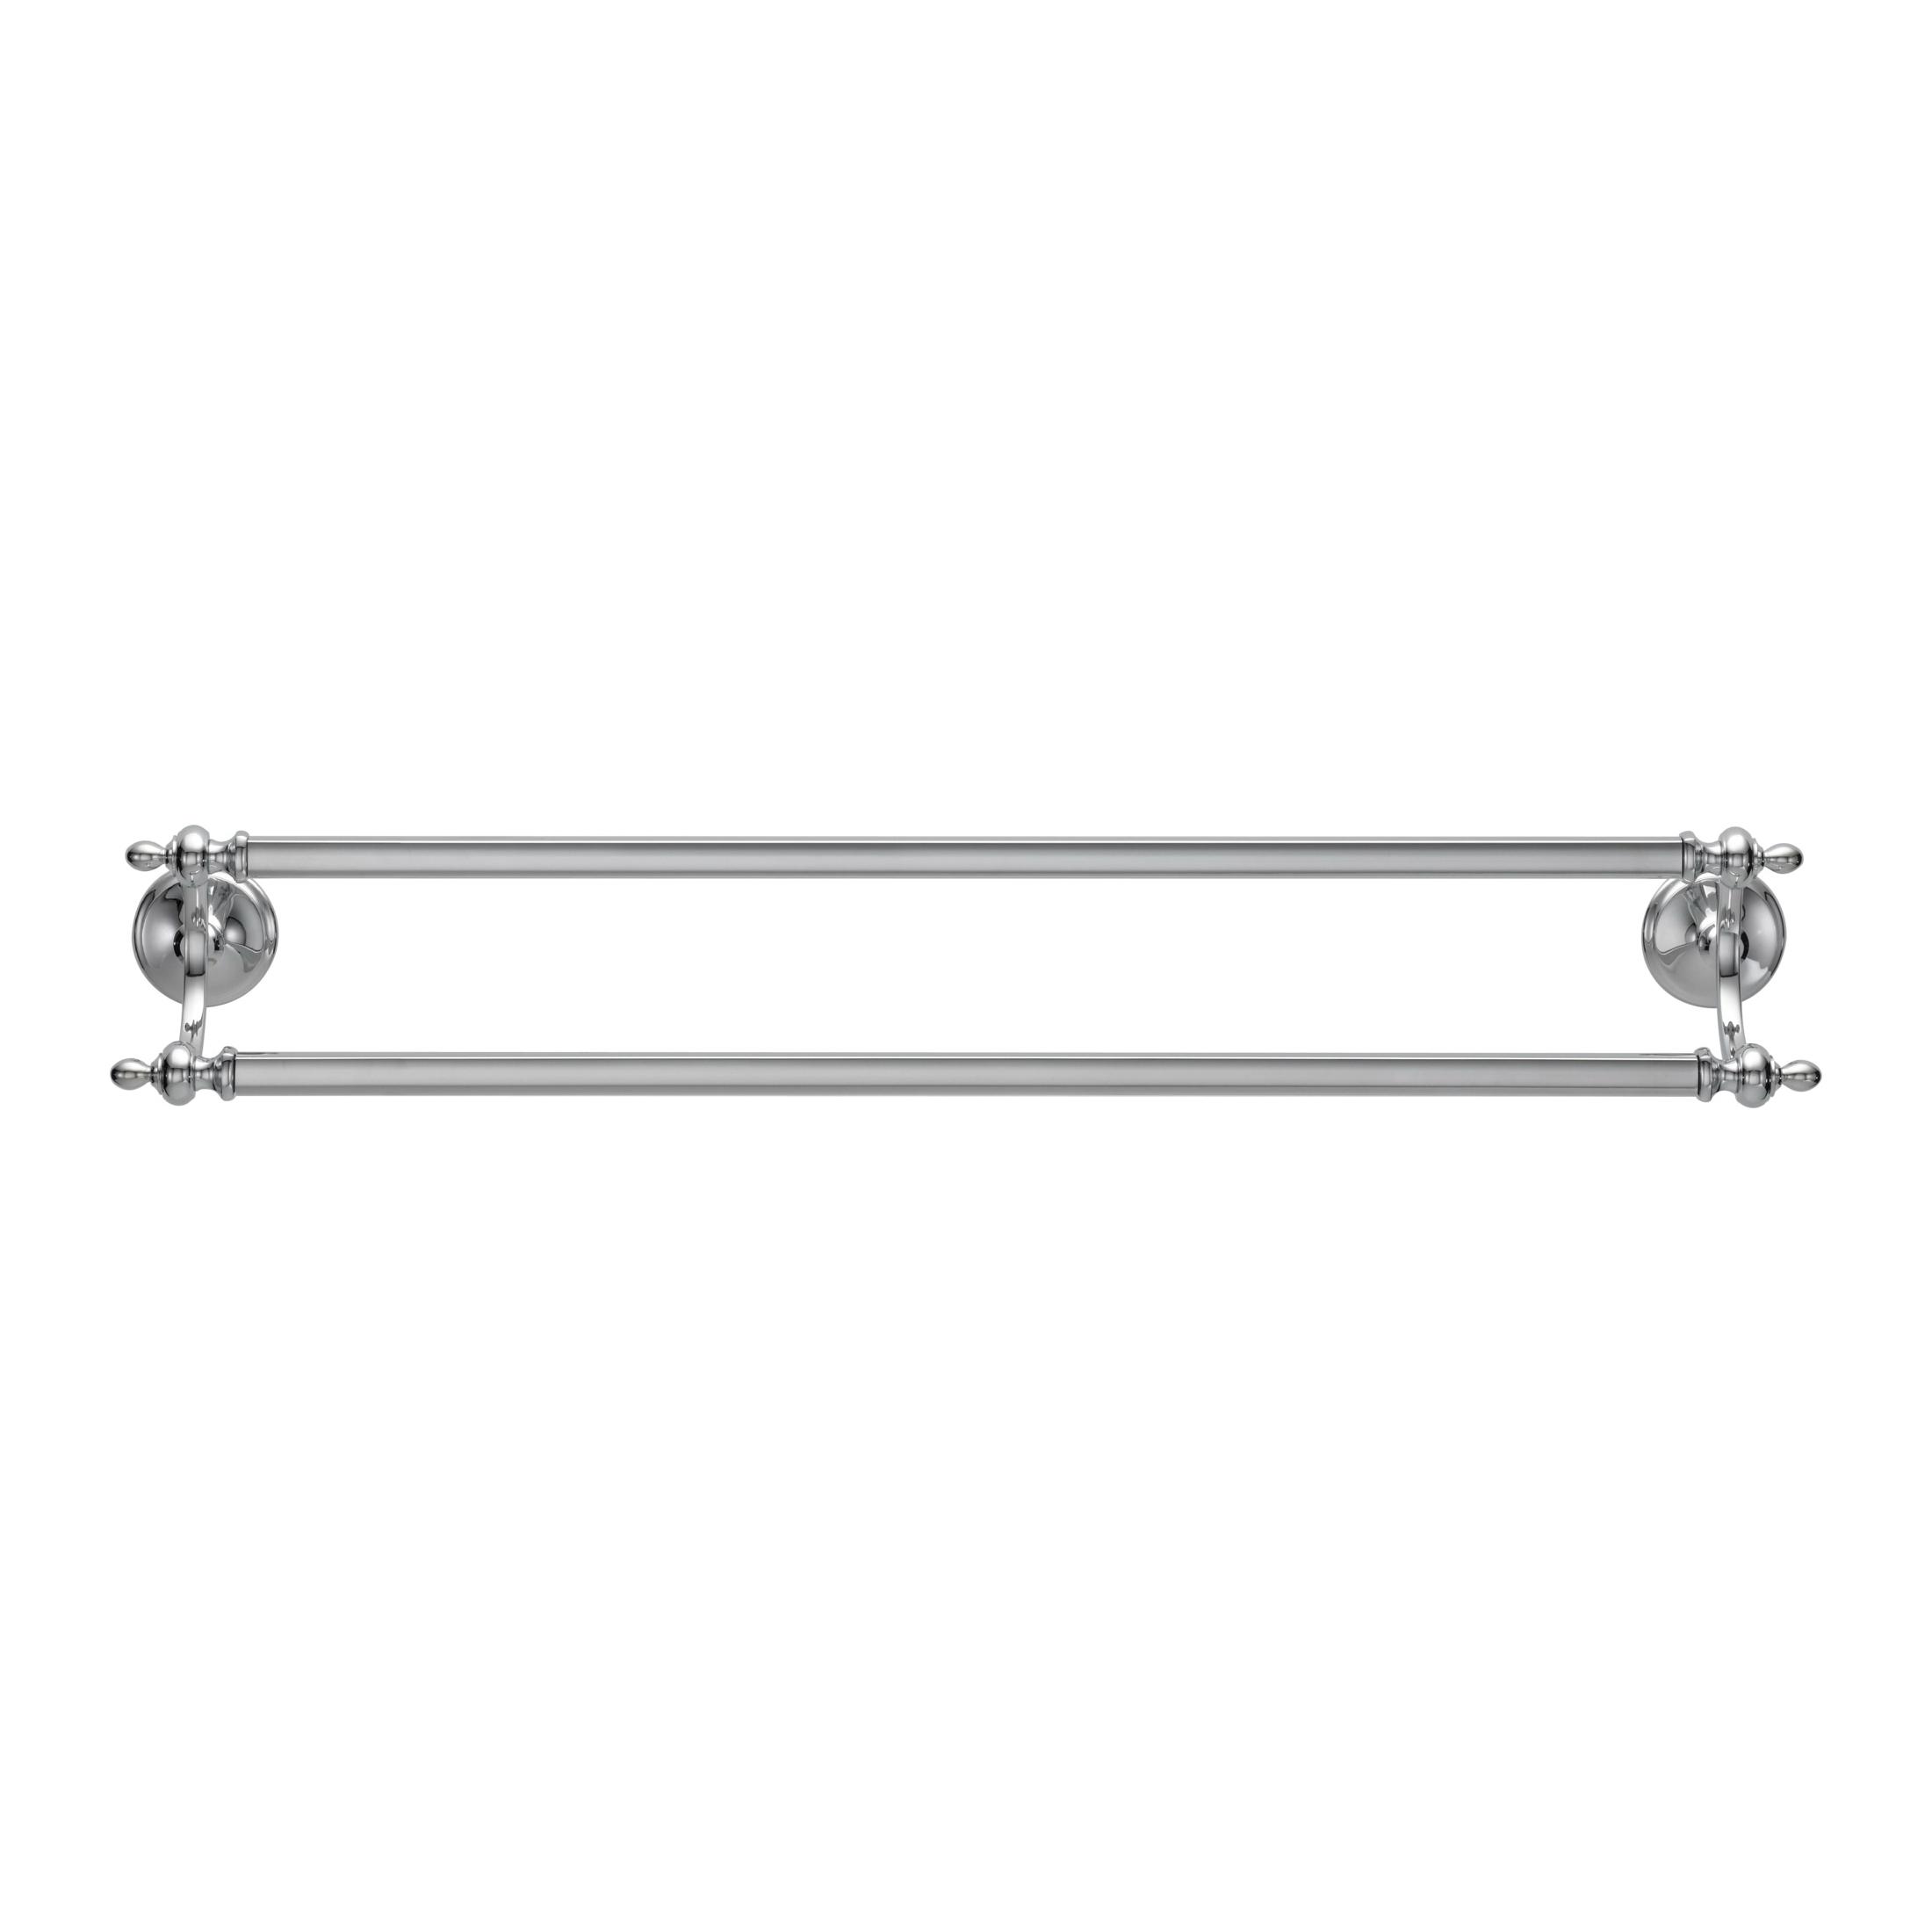 Brizo® 692585-PC Charlotte® Square Towel Bar, 24 in L Bar, 3-5/8 in OAD x 2-3/8 in OAH, Import